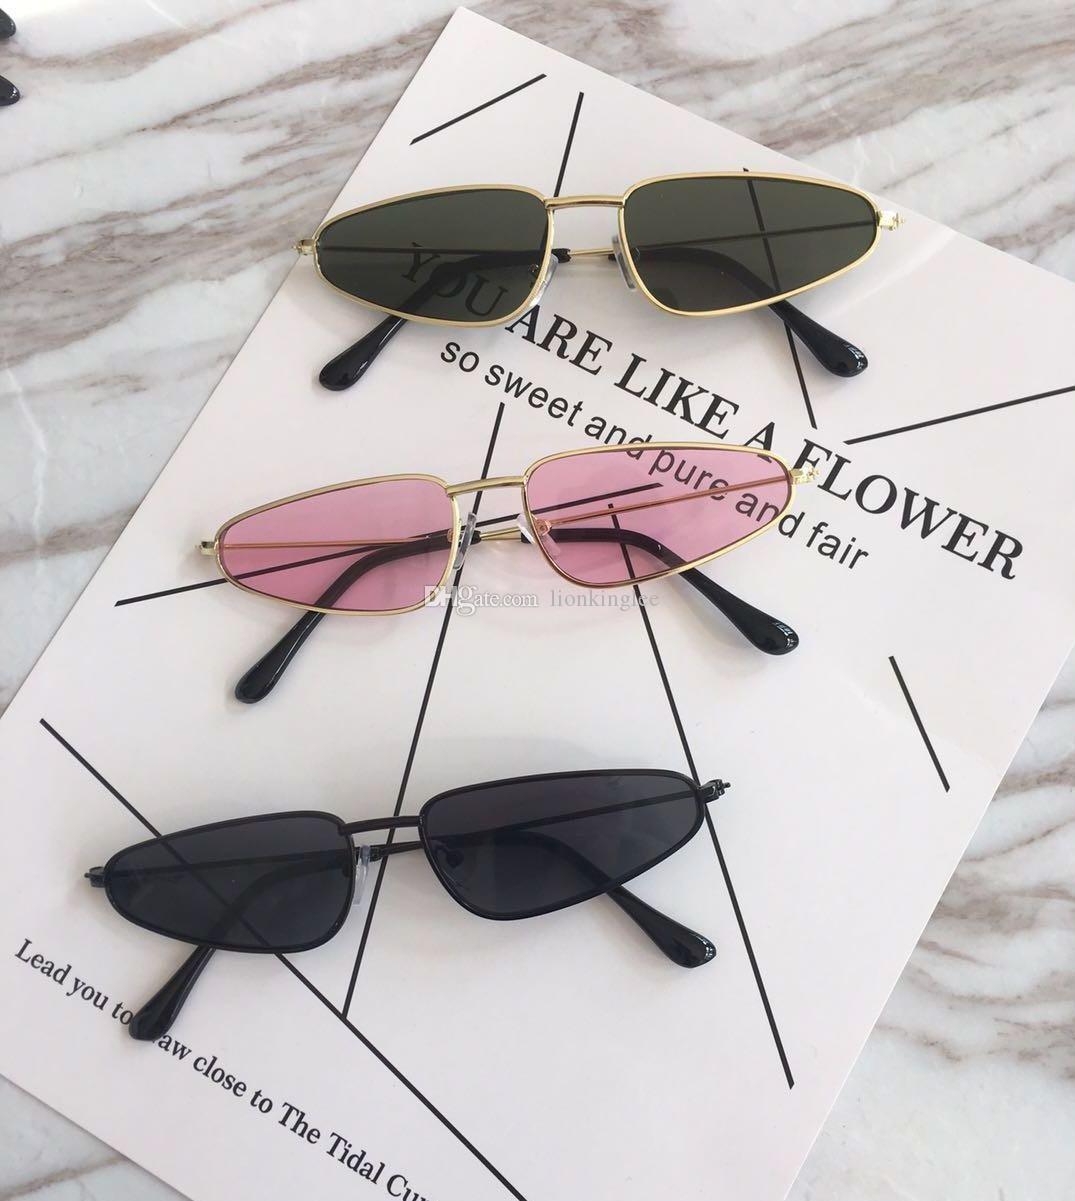 6198528d08 2018 Small Triangle Sunglasses Women Men Brand Designer Glasses 90S Retro  Slim Skinny Sun Glasses Red Tint Transparent Shades 161 Sunglasses Hut  Reading ...